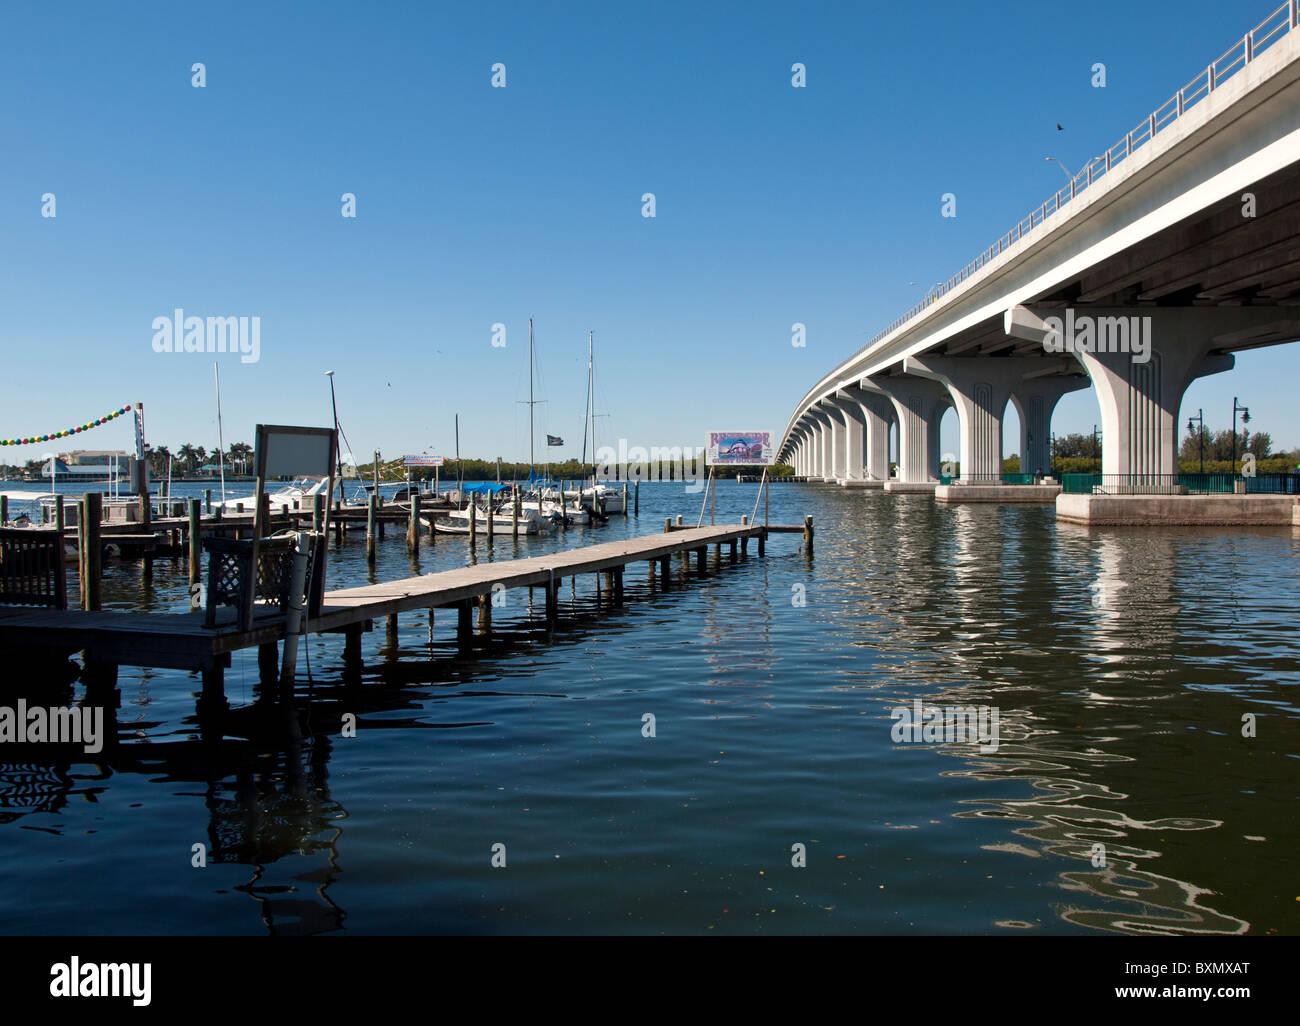 Beachland boulevard in vero beach florida stock photo for Vero beach fishing pier